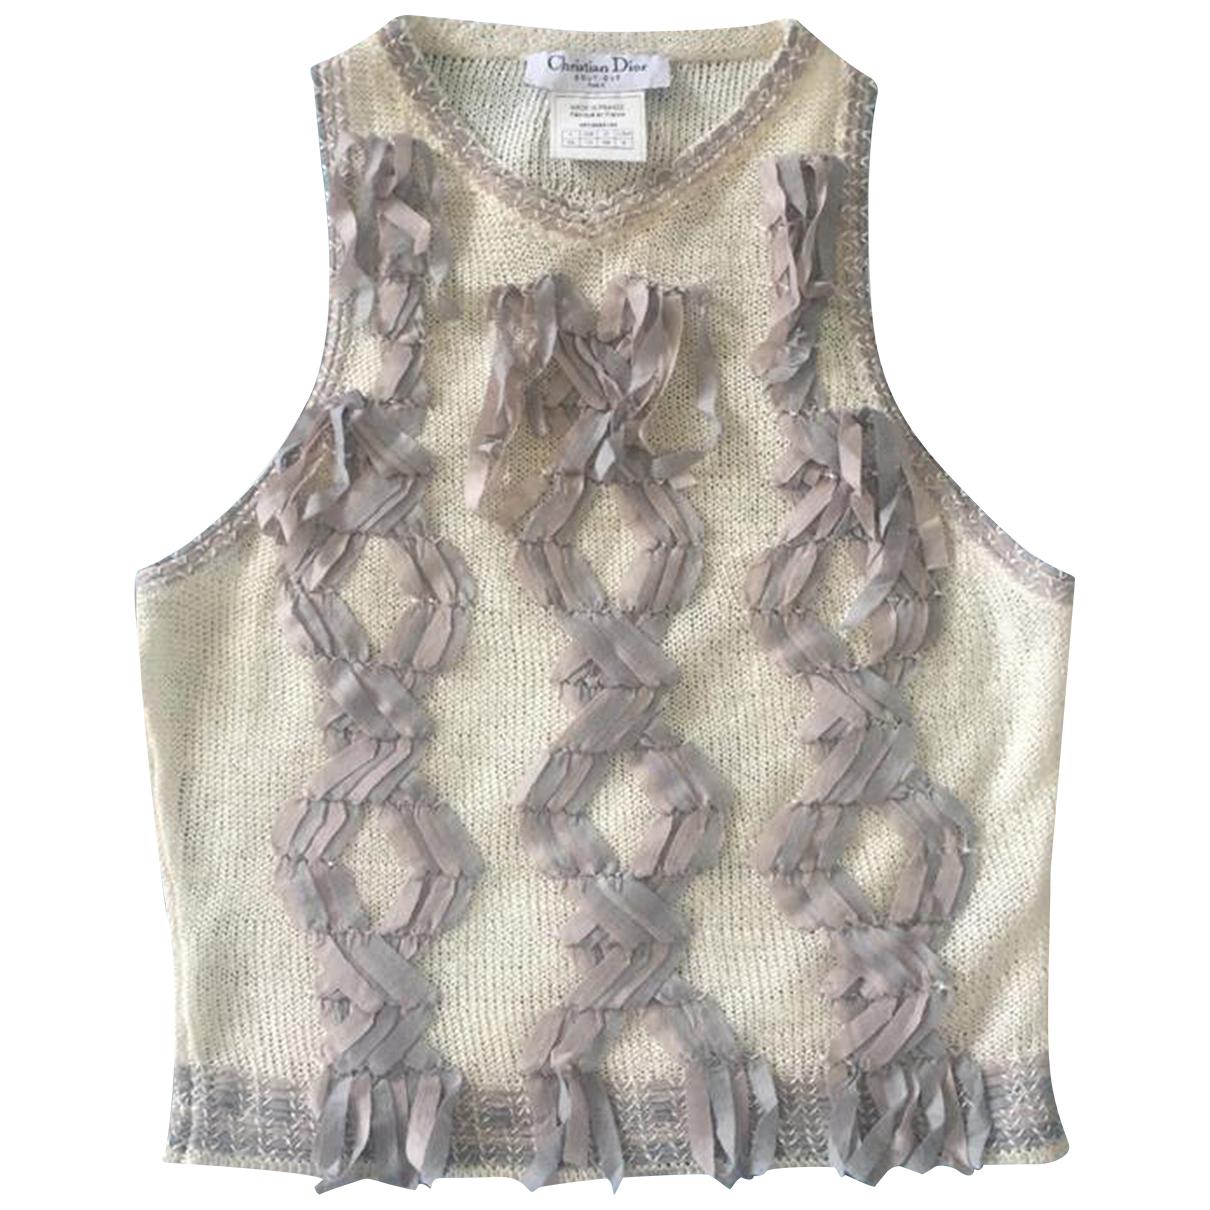 Dior \N Ecru Linen Knitwear for Women S International